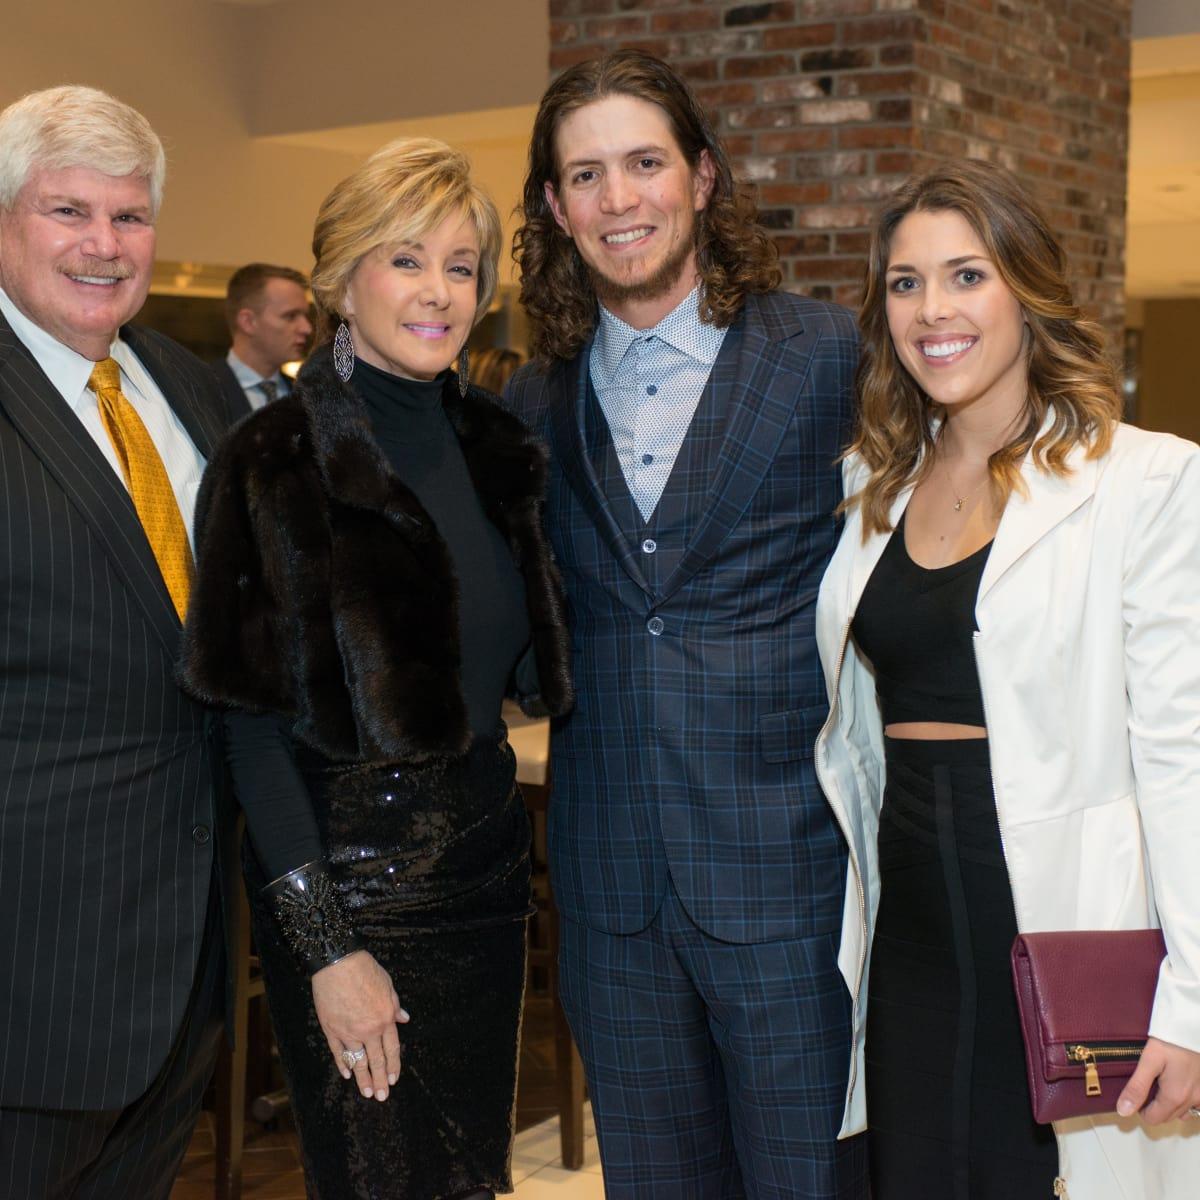 Astros Diamond Gala, Jan. 2016, Ken Giles, Janet Gurwitch, Ron Franklin